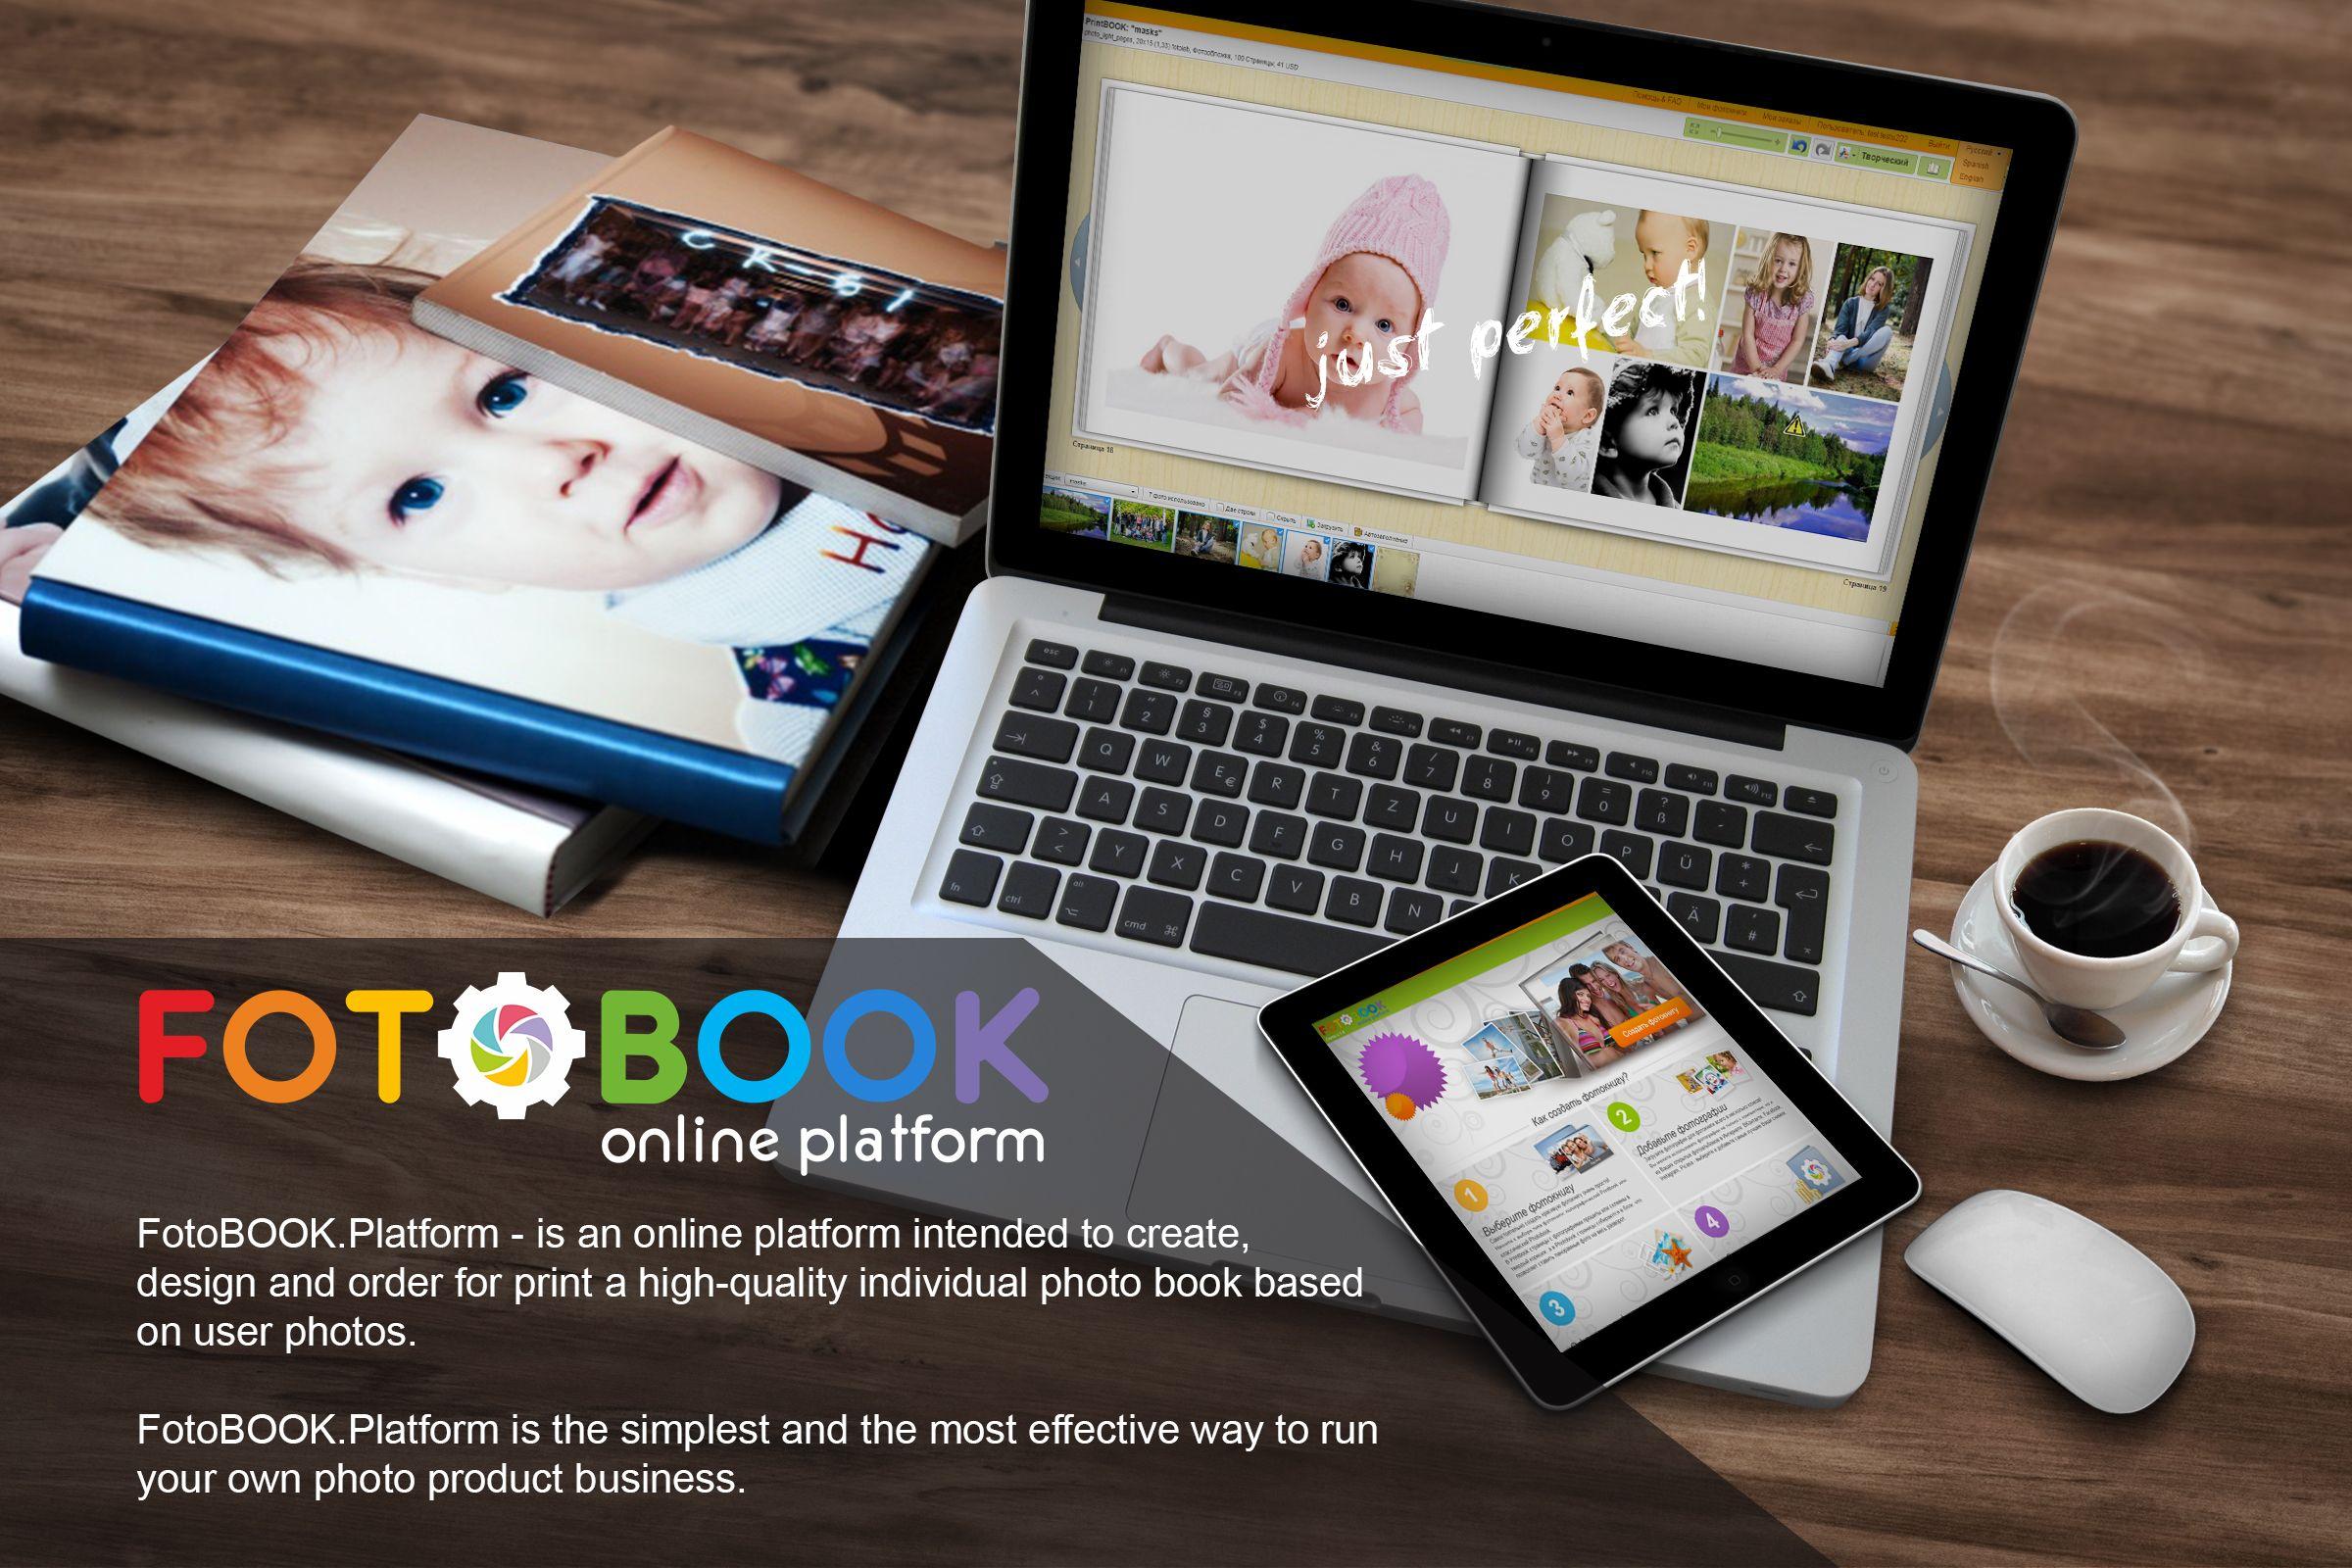 FotoBOOB Platform, online photo book editor | Web4Print